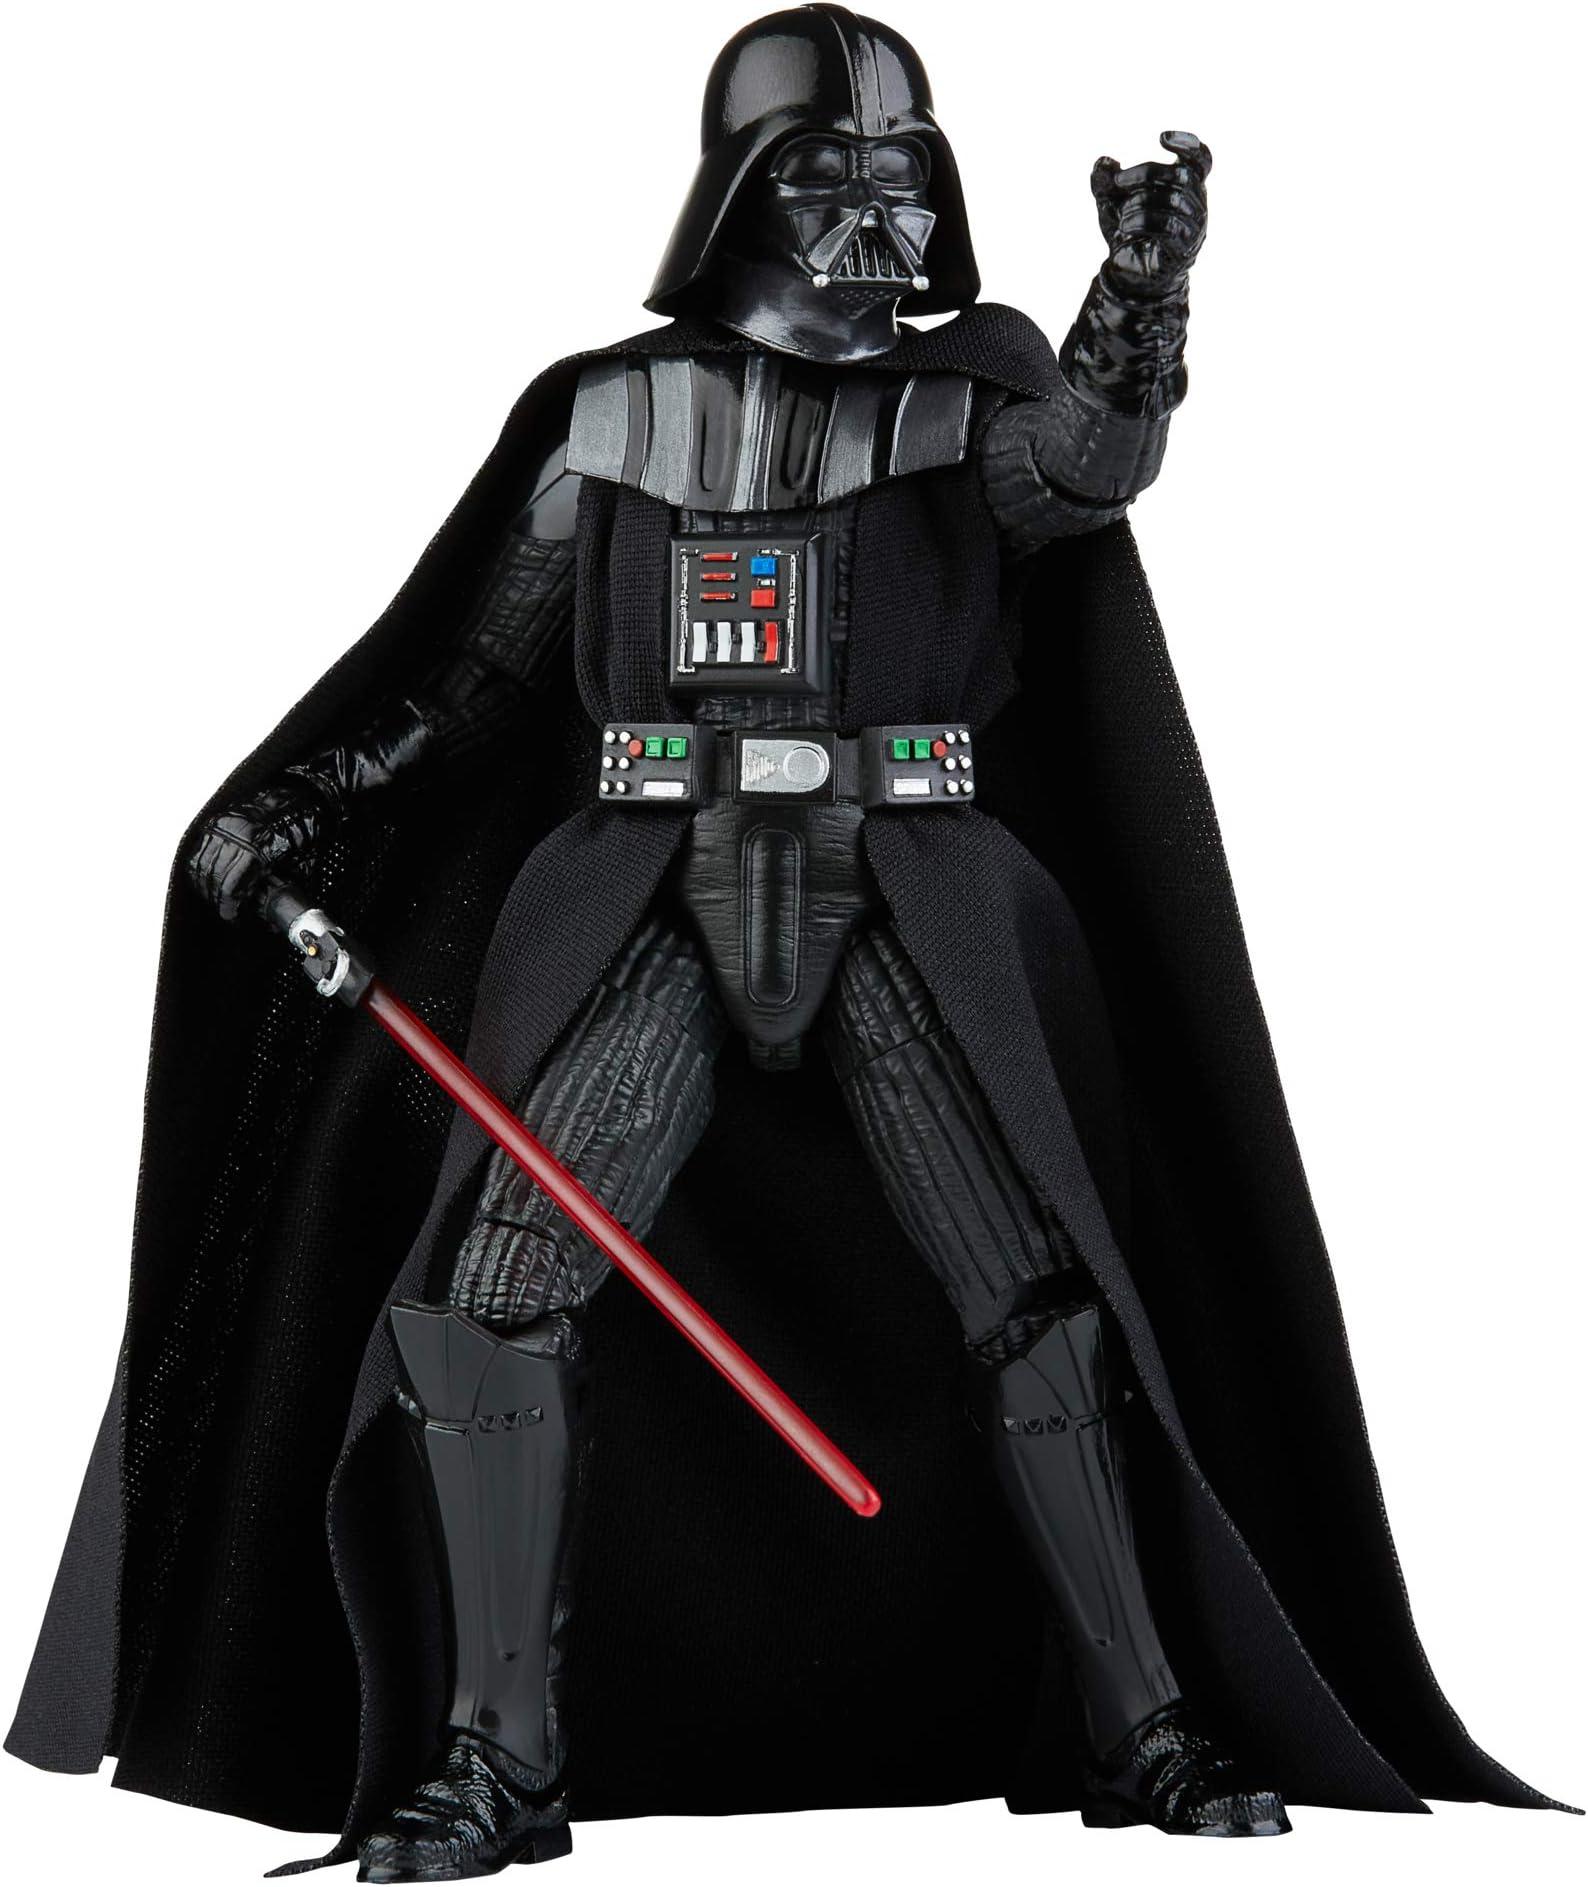 IN HAND Star Wars Black Series Carbonized Darth Vader Amazon 40th Anniversary